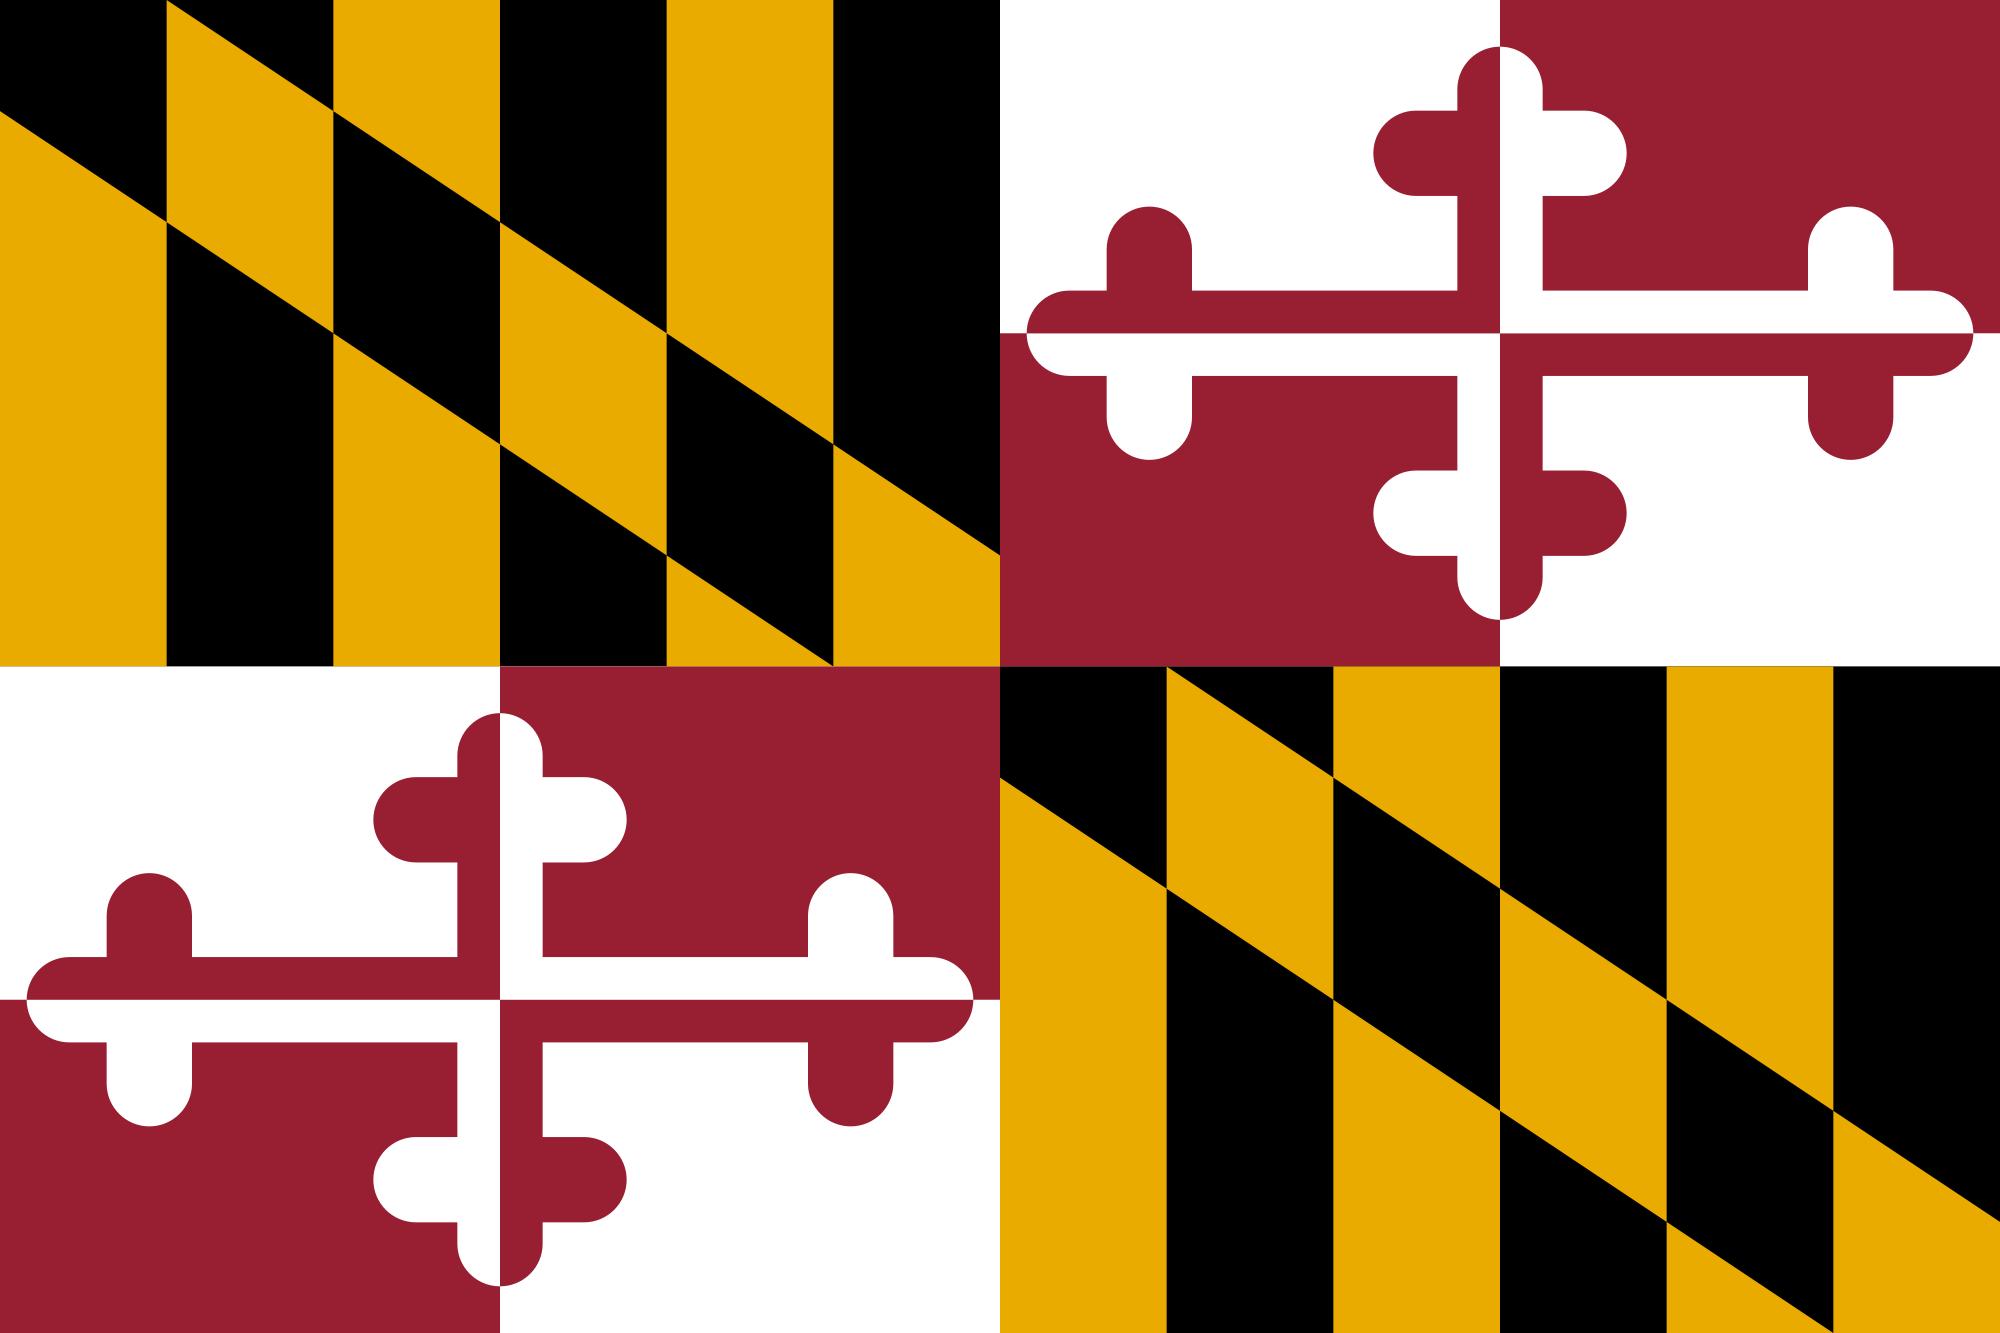 Maryland S November 2020 Covid 19 Update A Primer On Two Recent Directives Ogletree Deakins